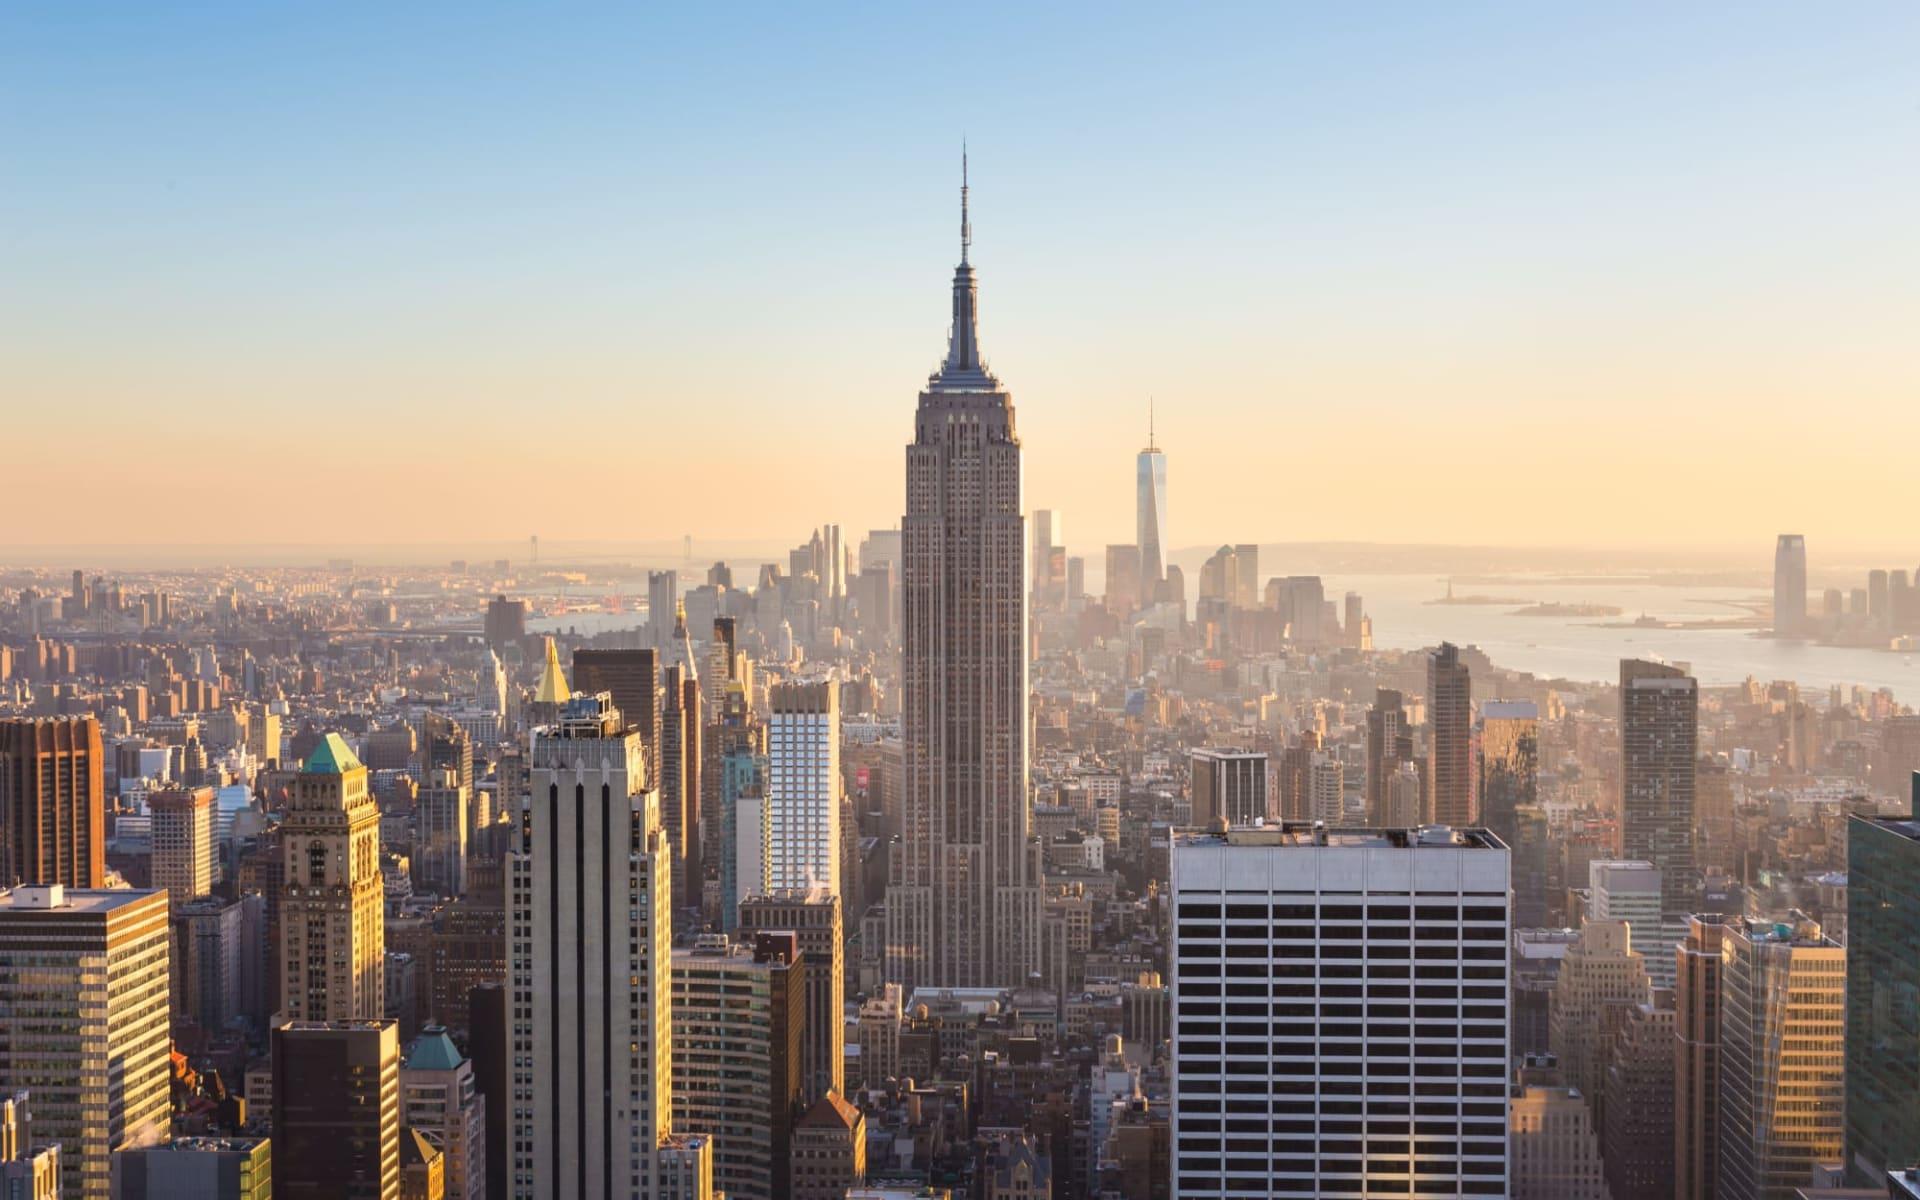 US Open ab New York - Manhattan: New York - New York City - Blick auf Emire State Building